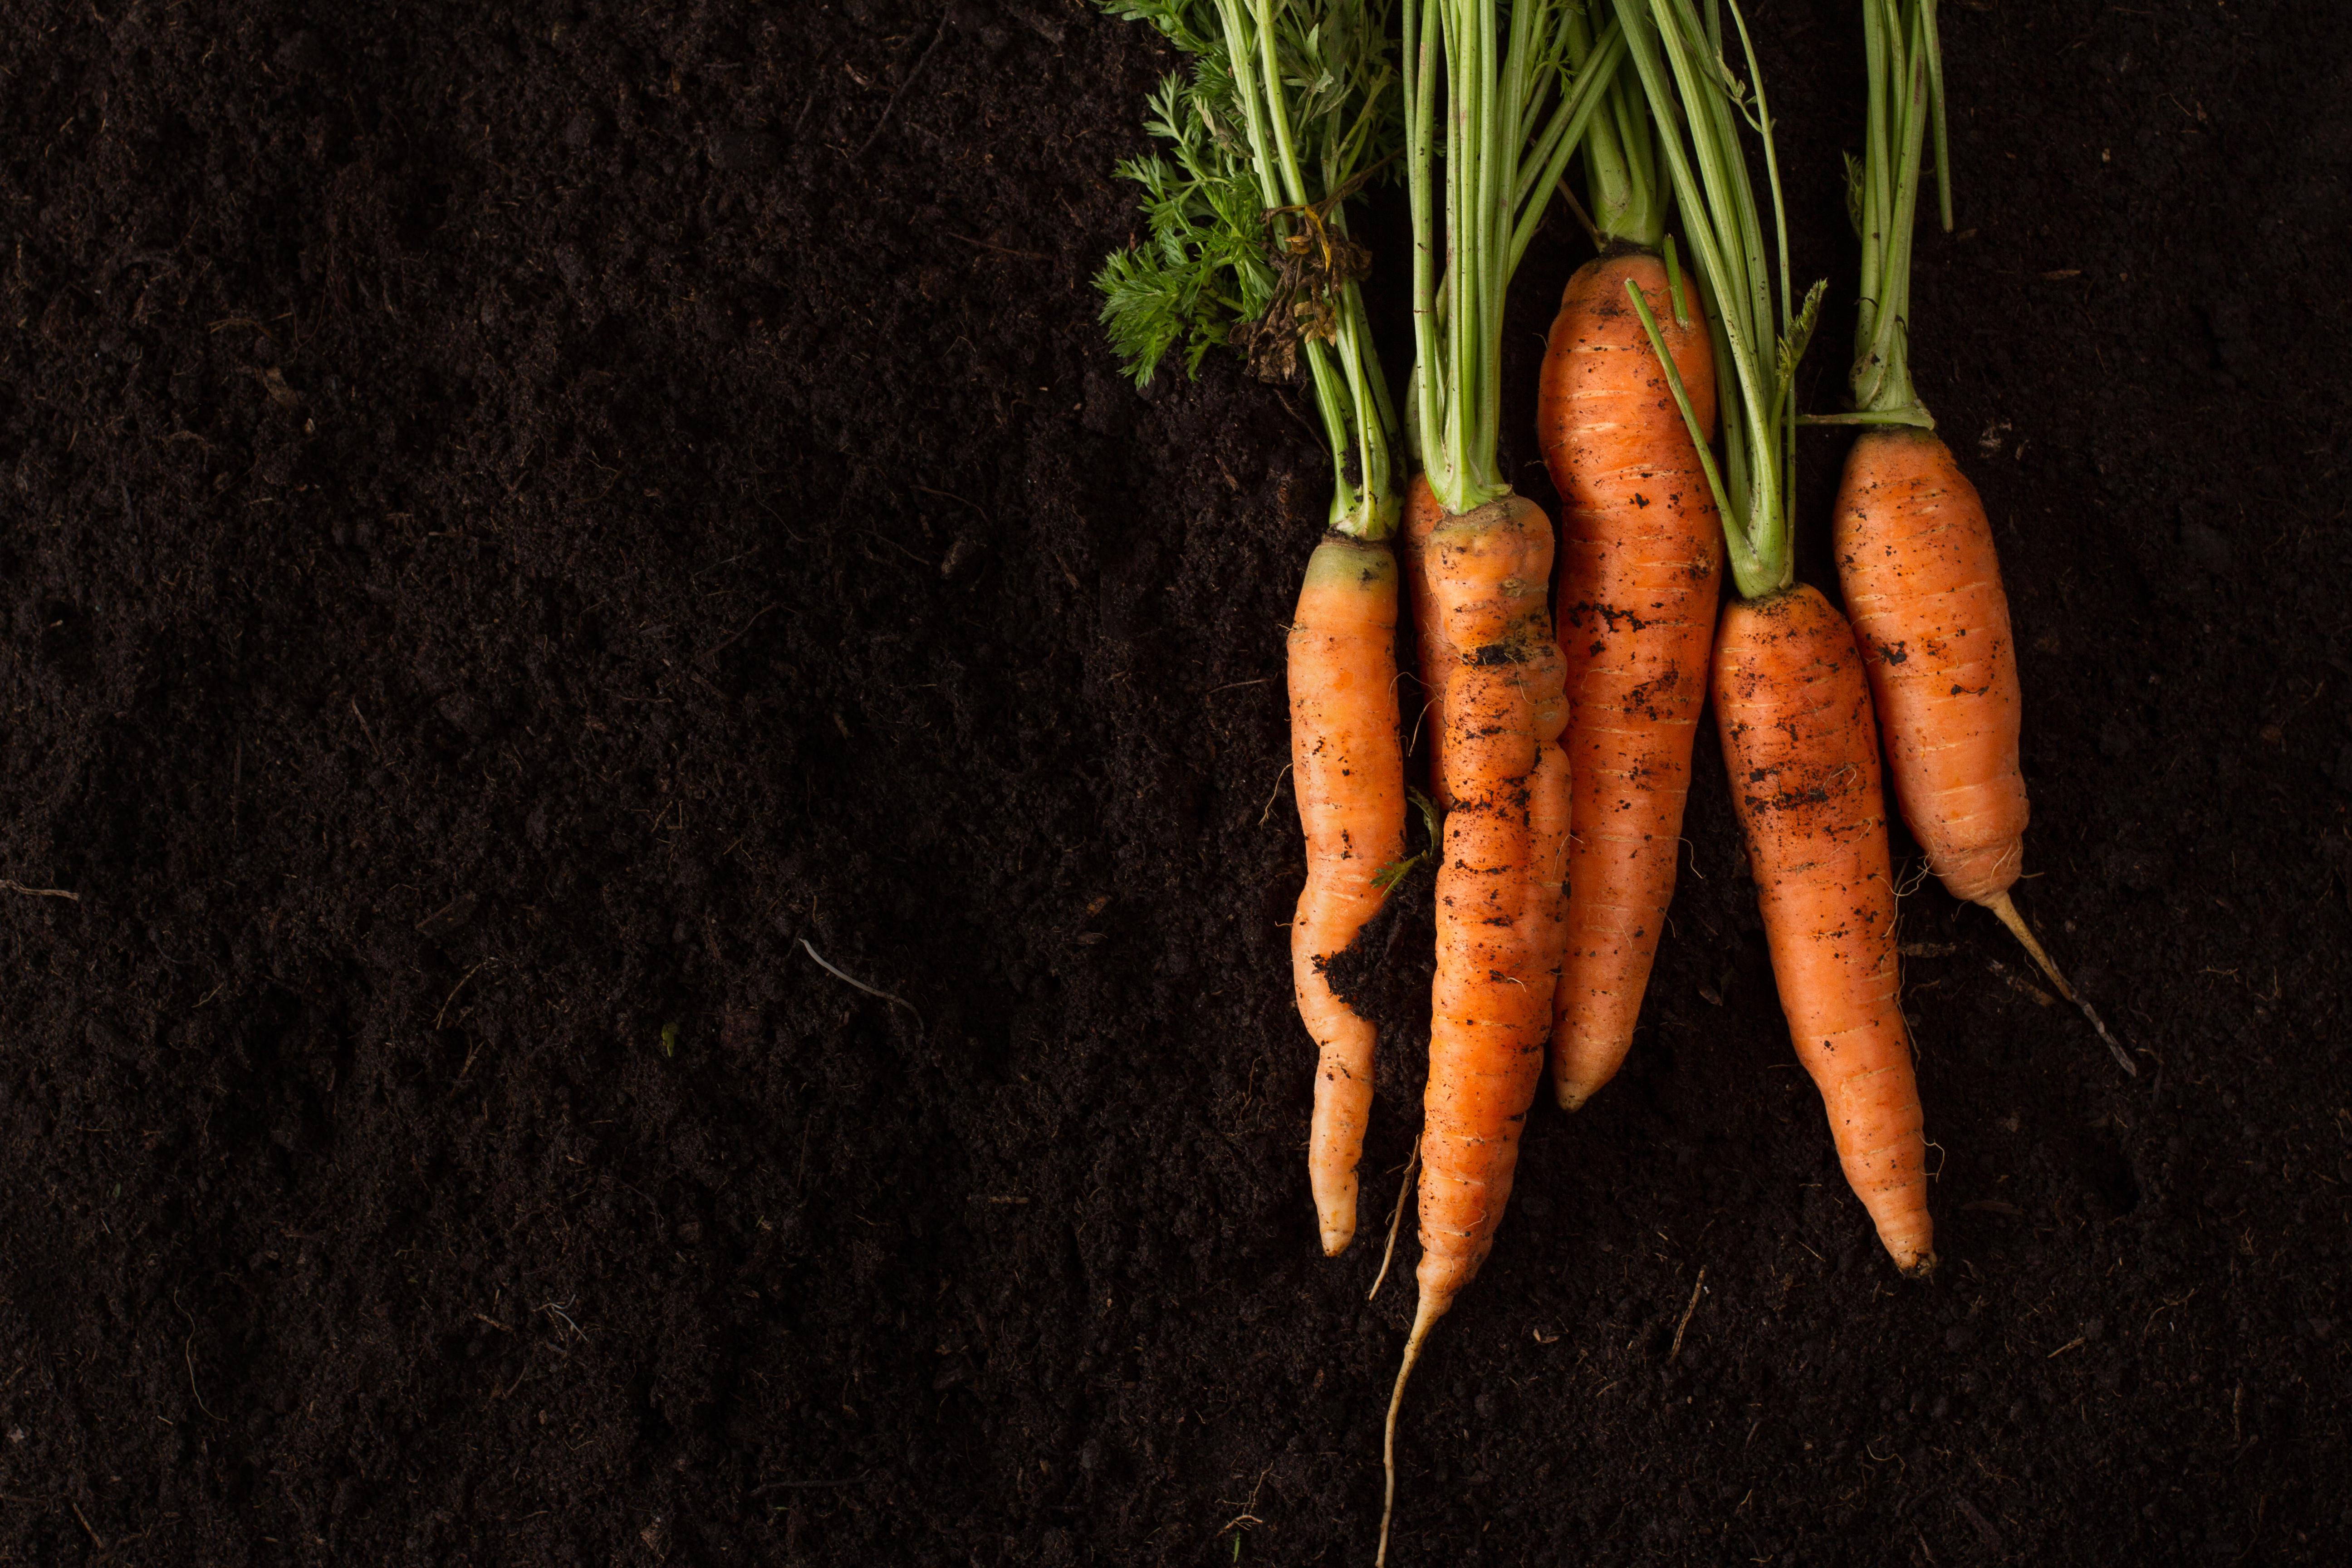 fresh-carrots-on-dark-soil-background-texture-P4NAXR7